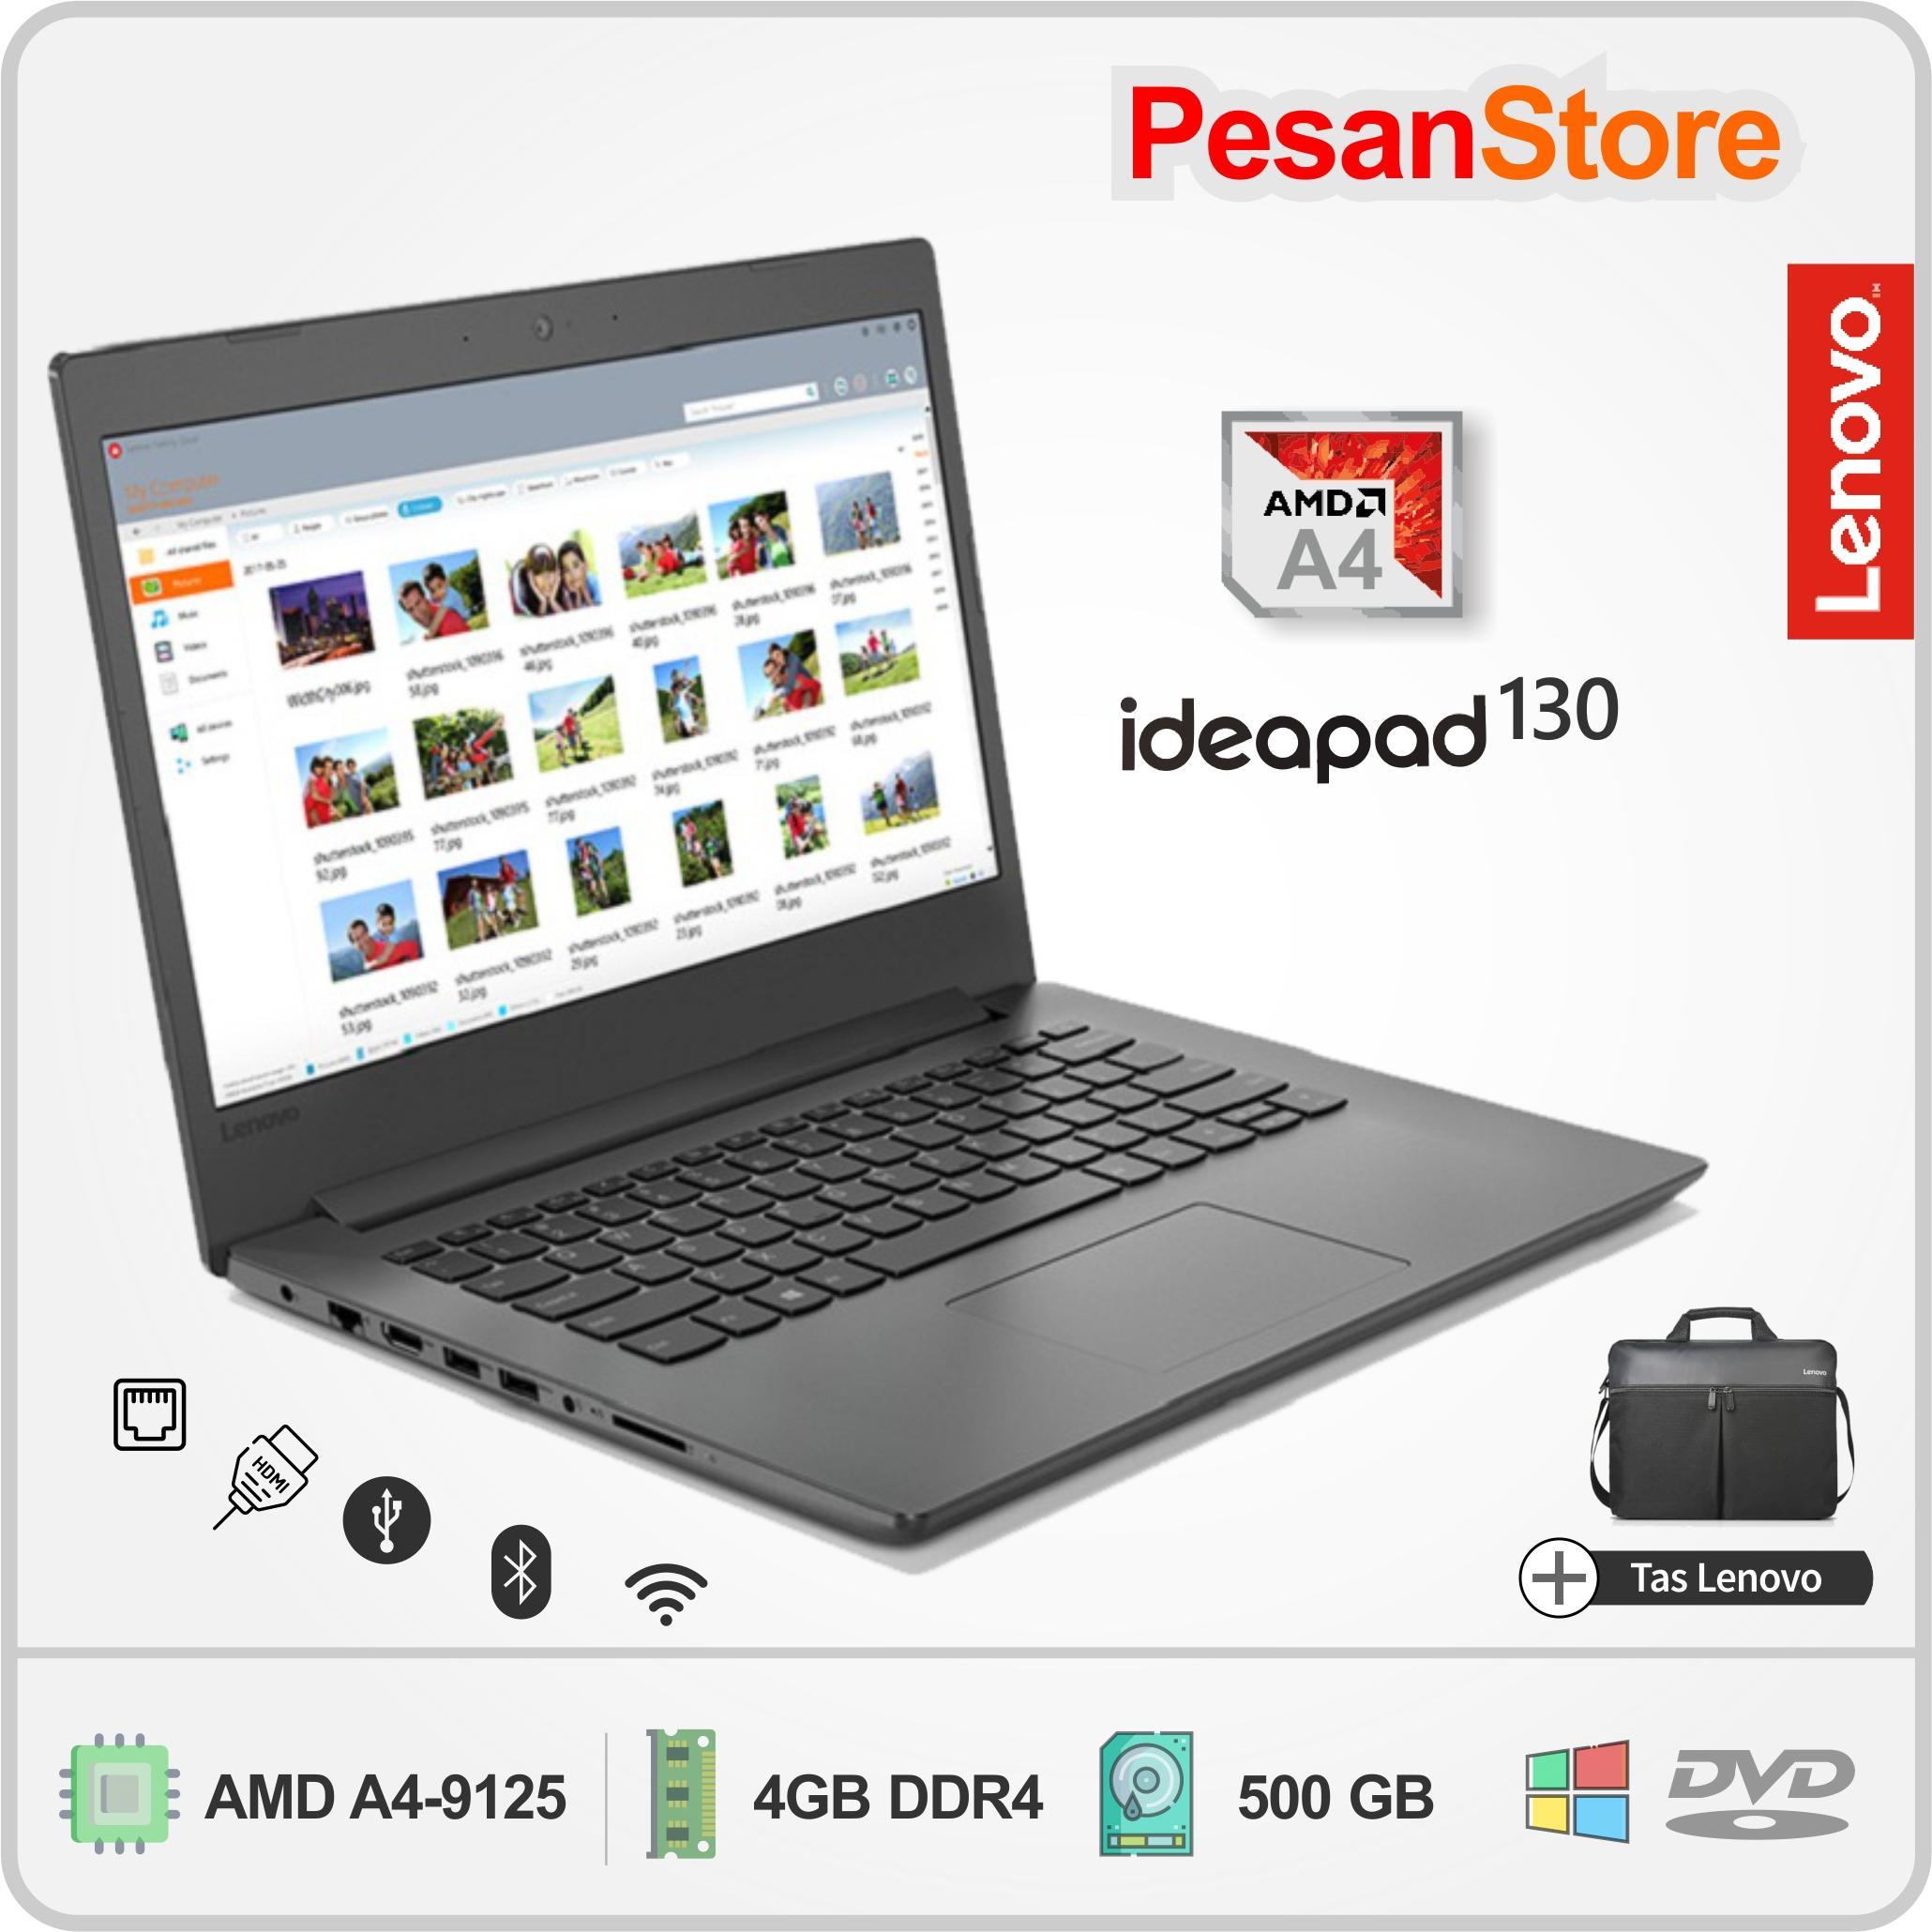 https://www.lazada.co.id/products/terlaris-lenovo-ideapad-ip-130-amd-a4-9125-windows-10-amd-radeon-r3-4gb-ddr4-500gb-14-inch-ip130-1-tahun-garansi-resmi-14ast-i156289469-s176875055.html